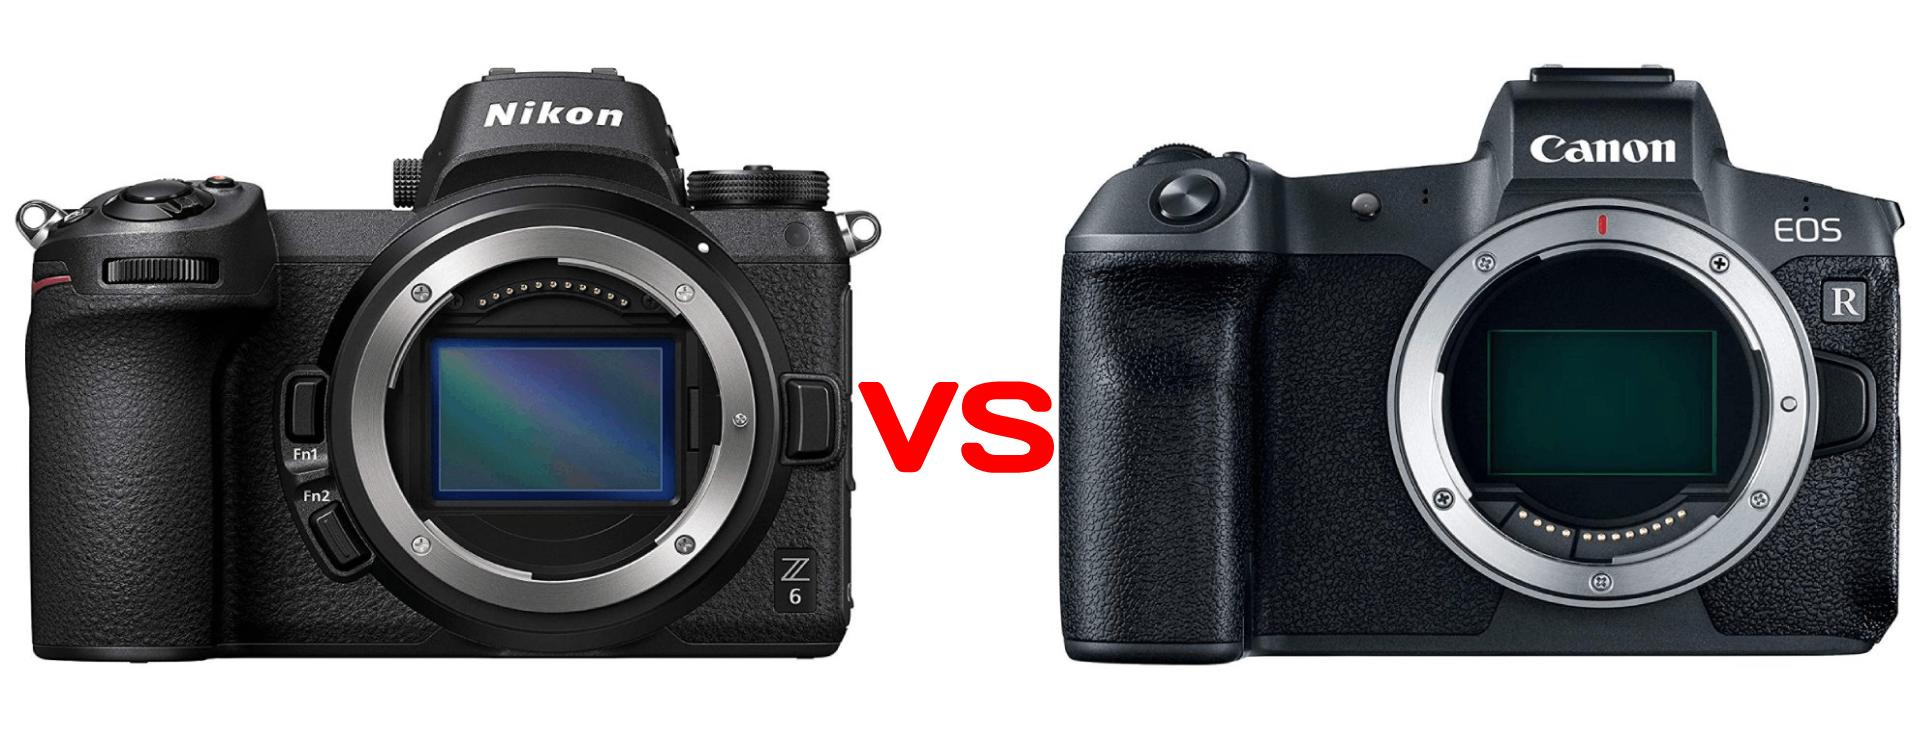 nikon z6 vs canon eos r image